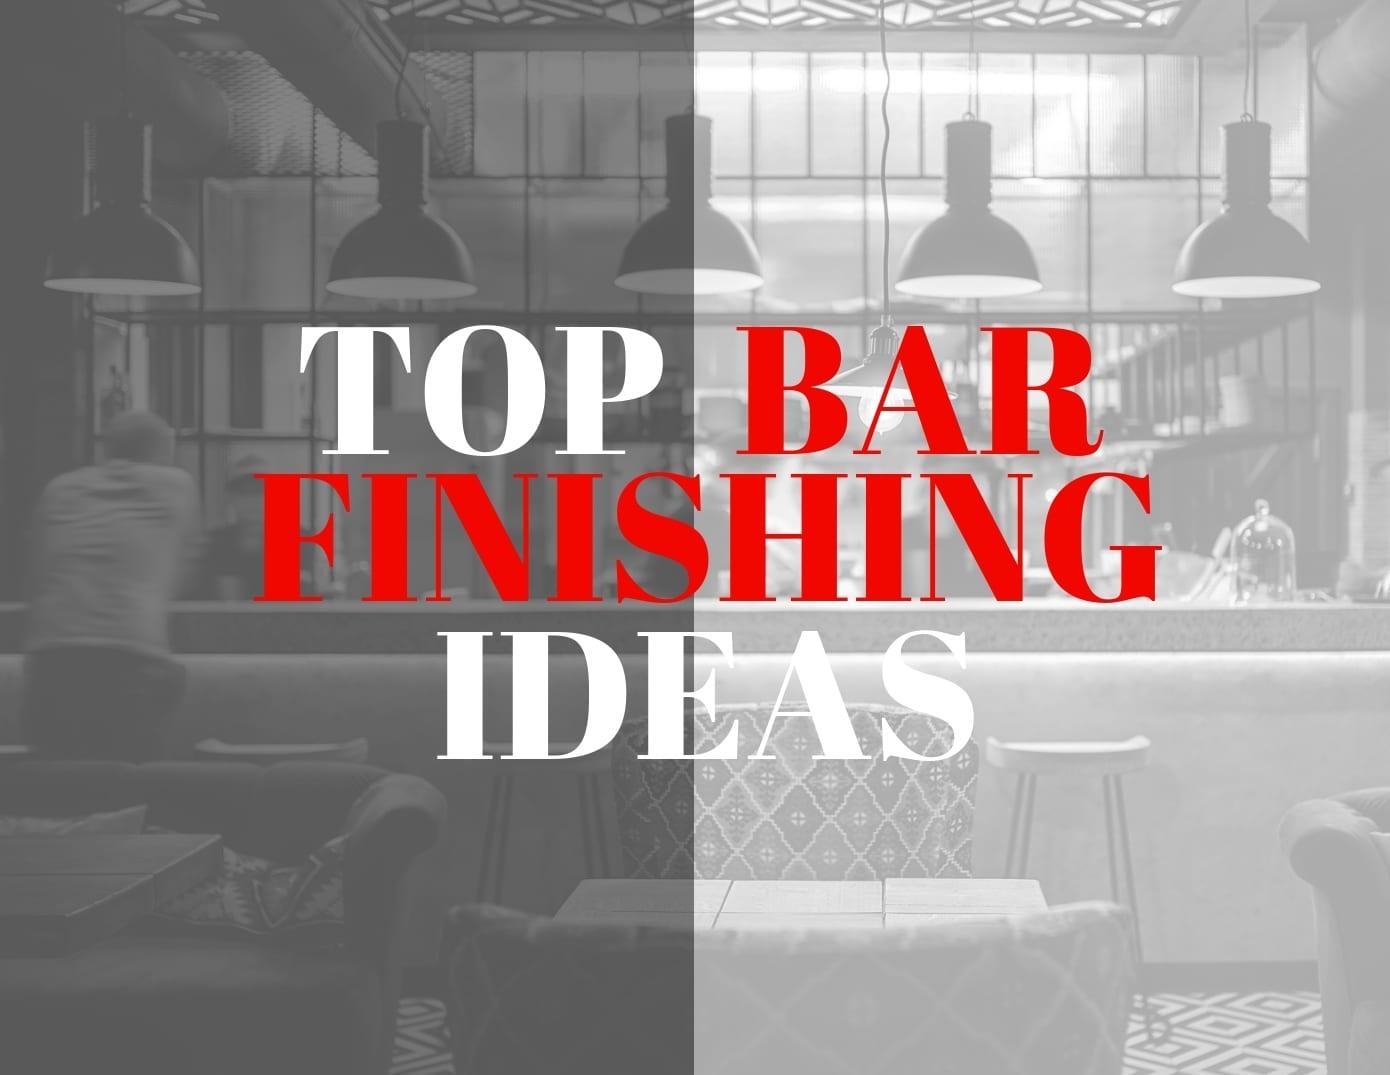 Top bar finishing ideas